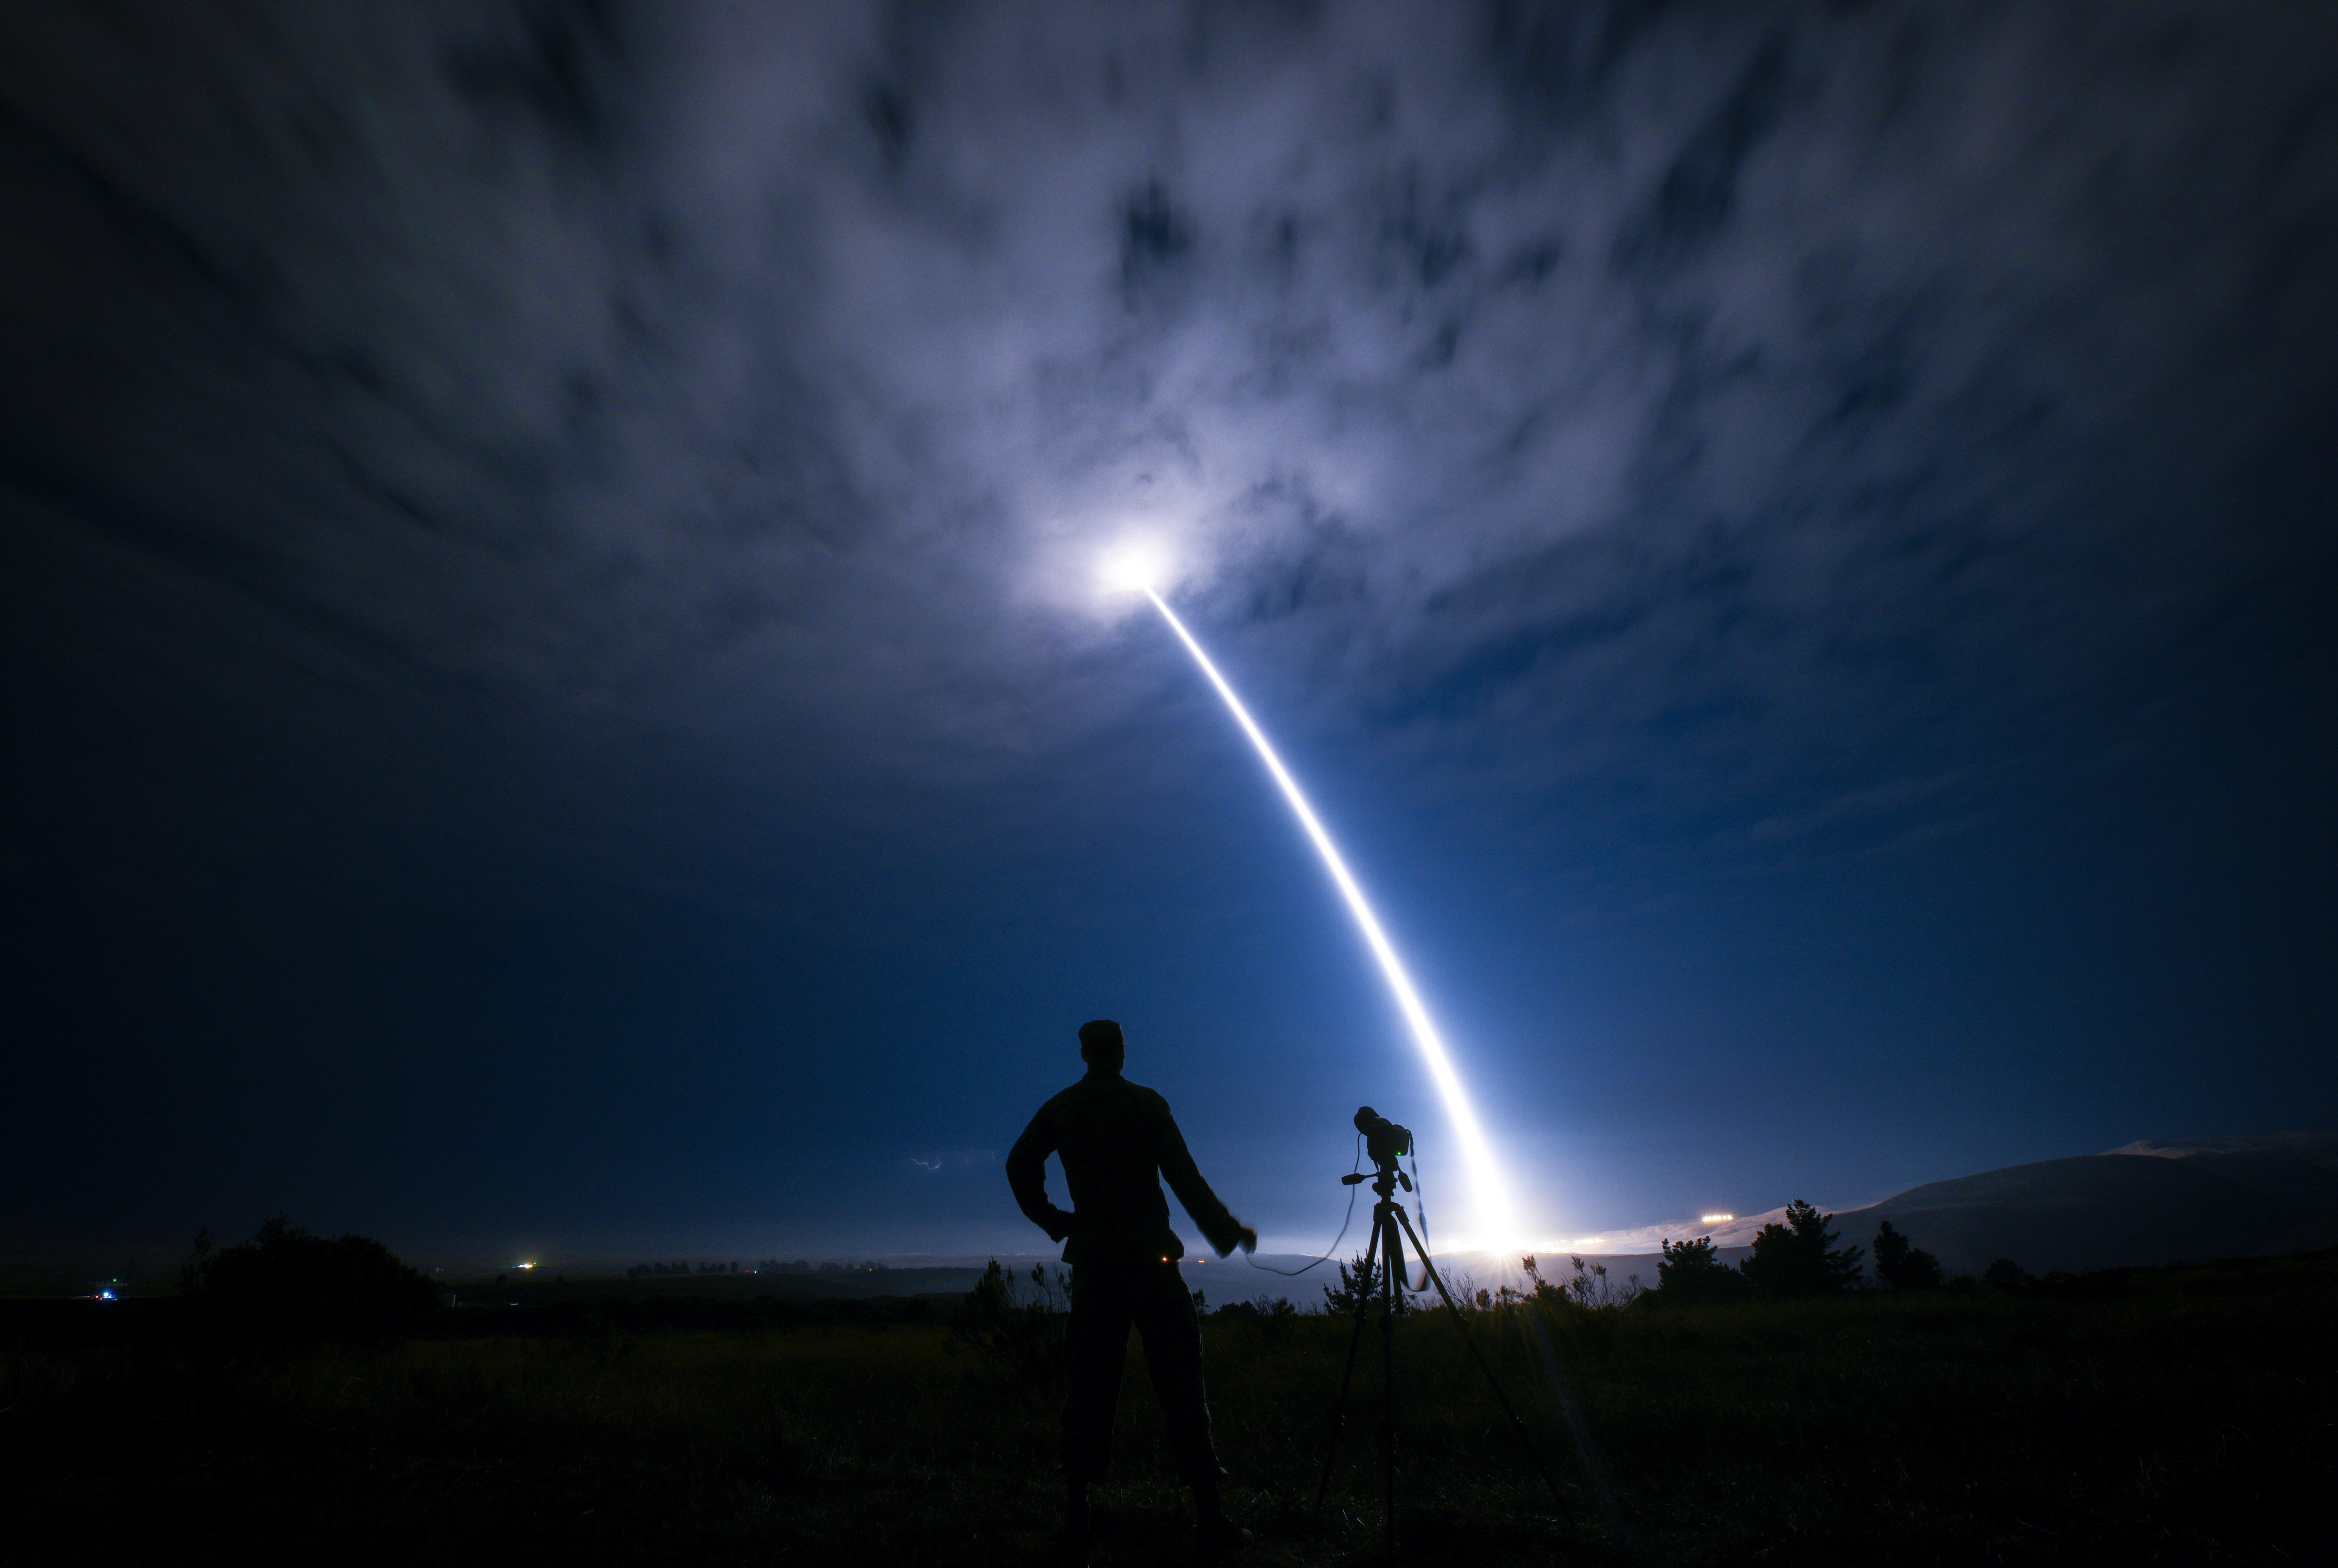 Senior Airman Ian Dudley photographs an unarmed Minuteman III intercontinental ballistic missile during an operational test Aug. 2, 2017, at Vandenberg Air Force Base, Calif. (Senior Airman Ian Dudley/U.S. Air Force)